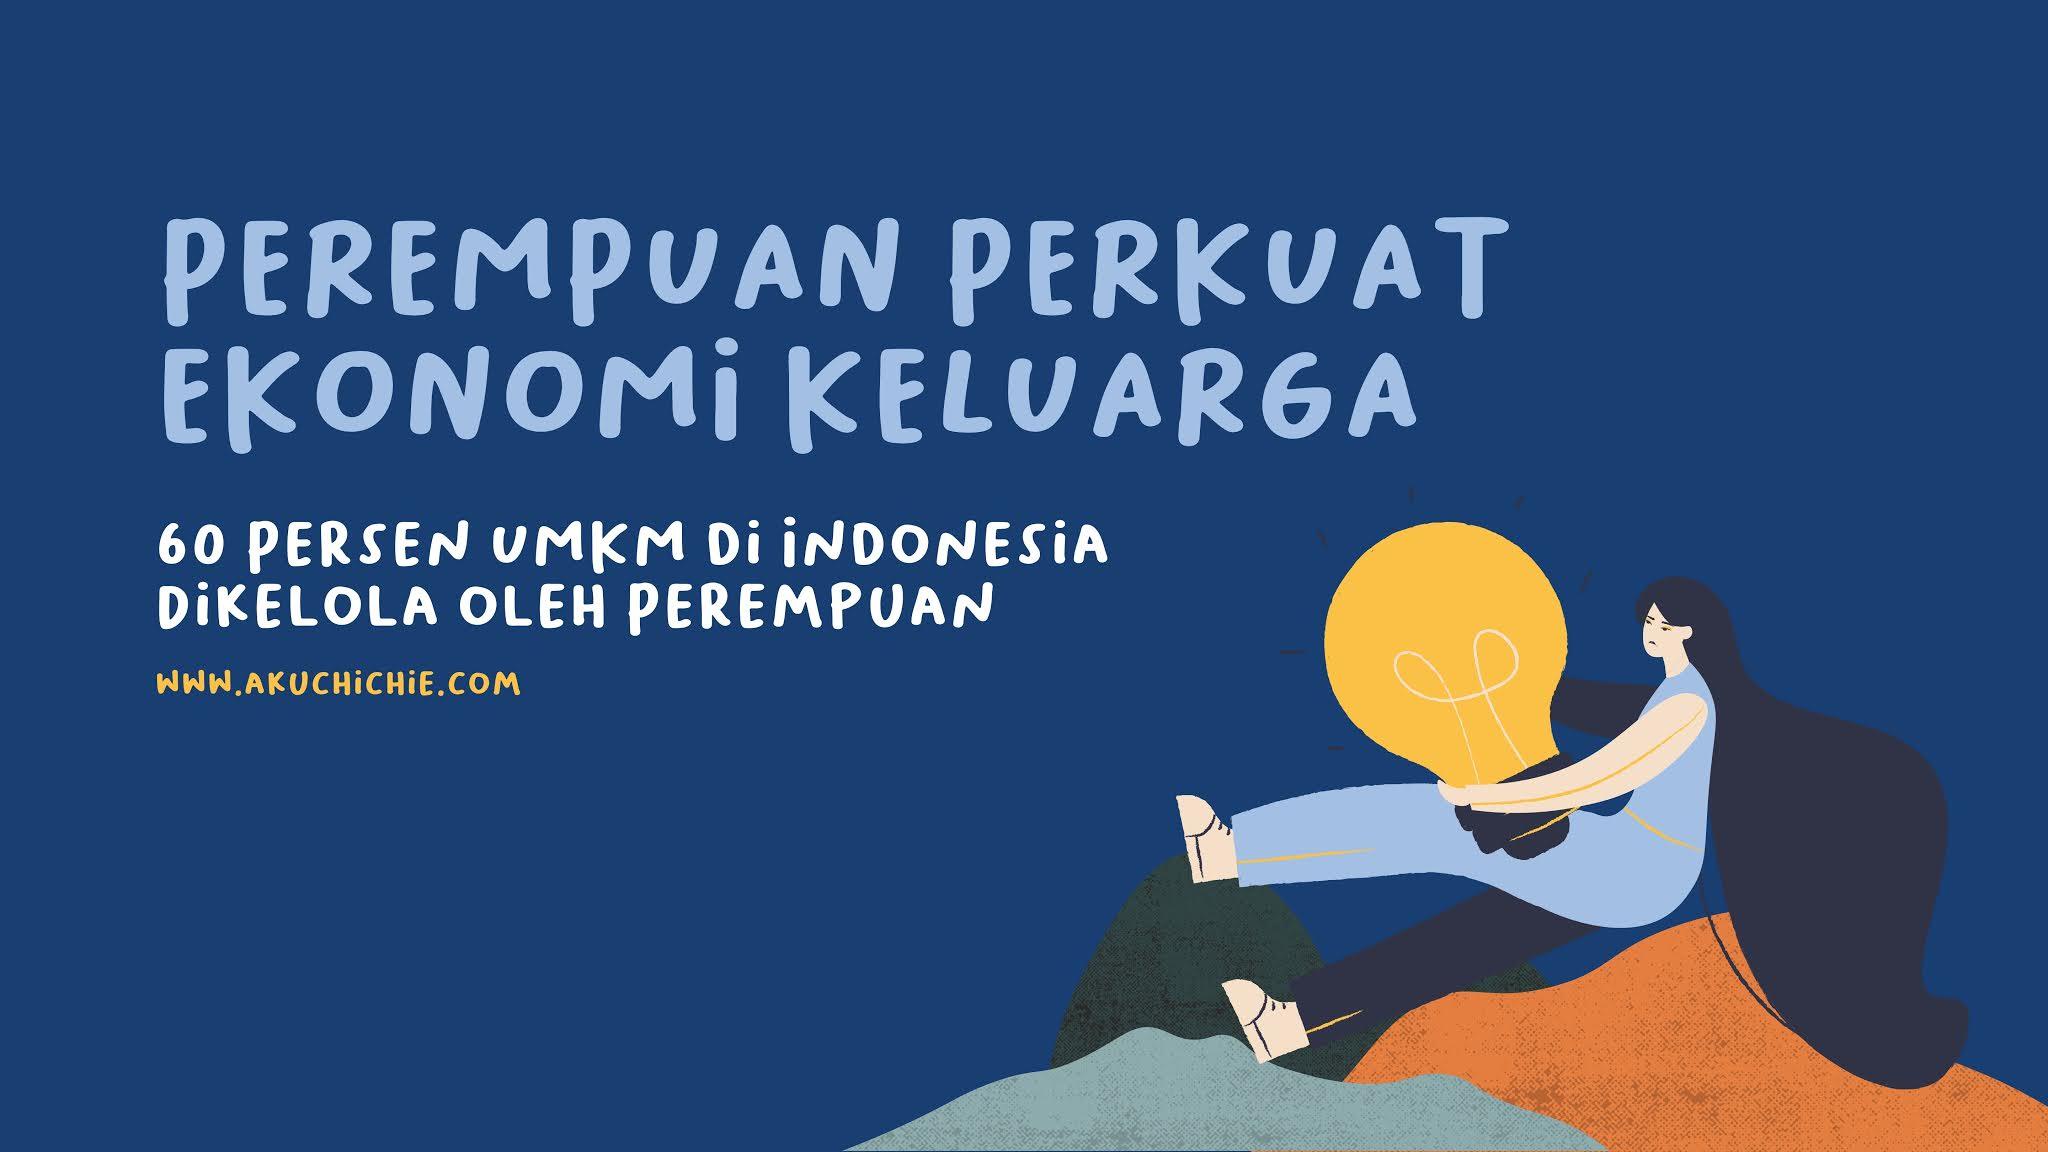 pelaku umkm di indonesia 60% perempuan